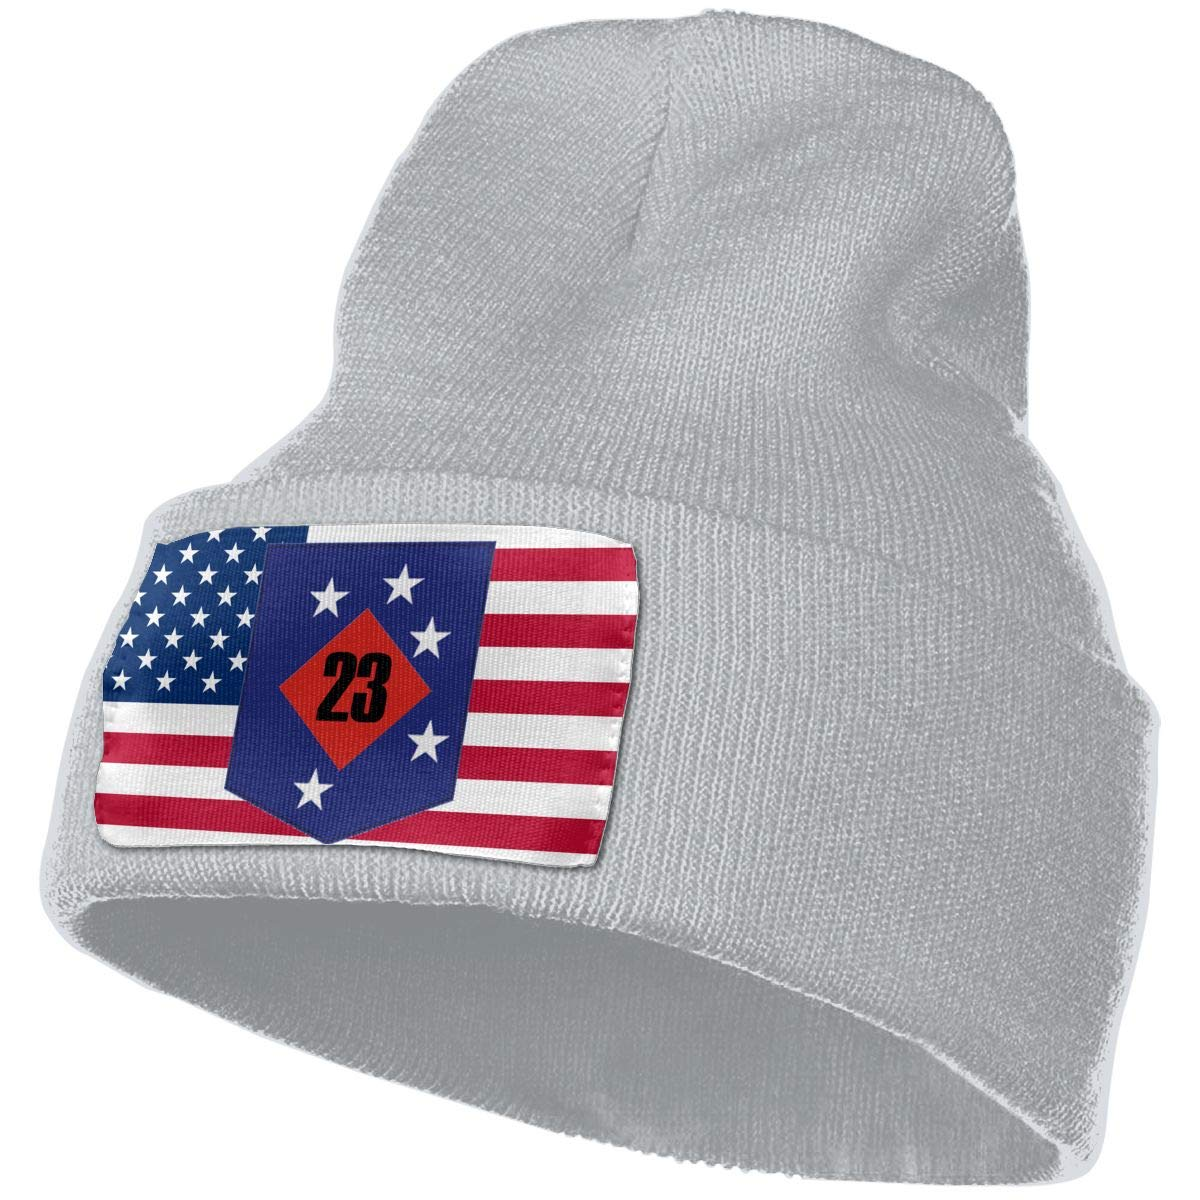 23rd Marine Regiment Men/&Women Warm Winter Knit Plain Beanie Hat Skull Cap Acrylic Knit Cuff Hat